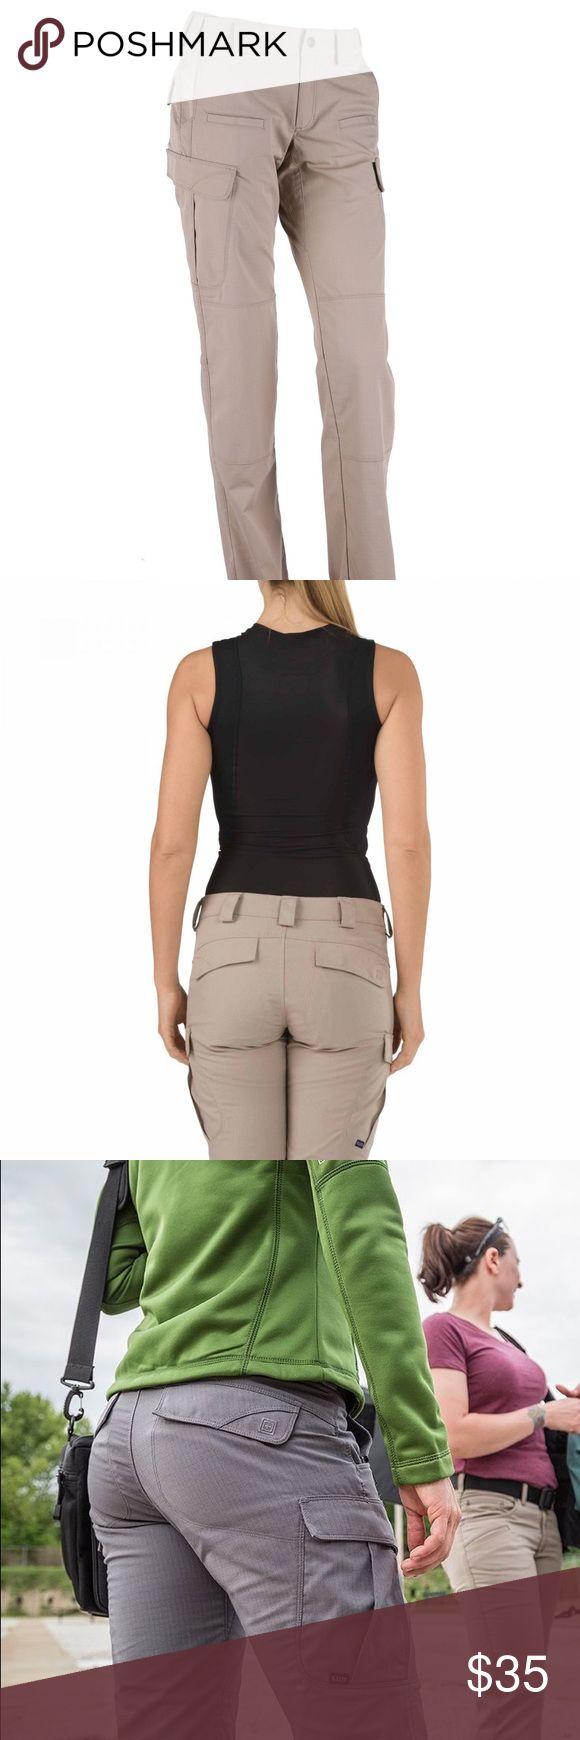 511 Khakis 511 Tactical Khakis NWOT Never Worn 511 Pants Trousers